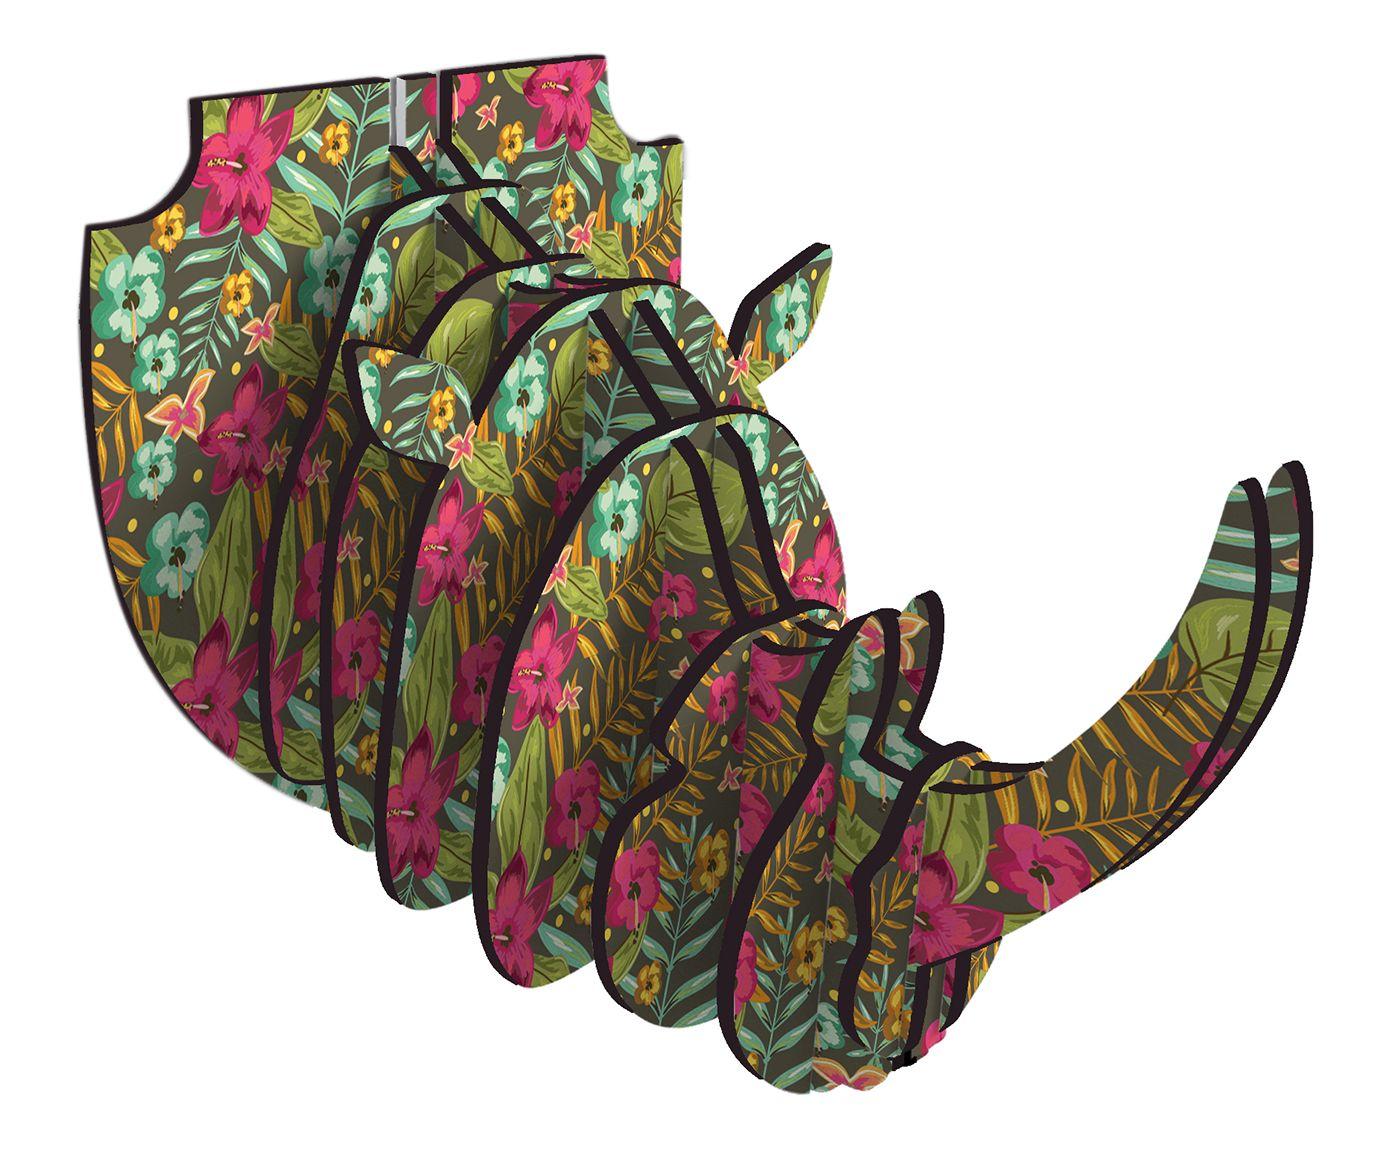 Adorno de Parede Rhino Jade | Westwing.com.br